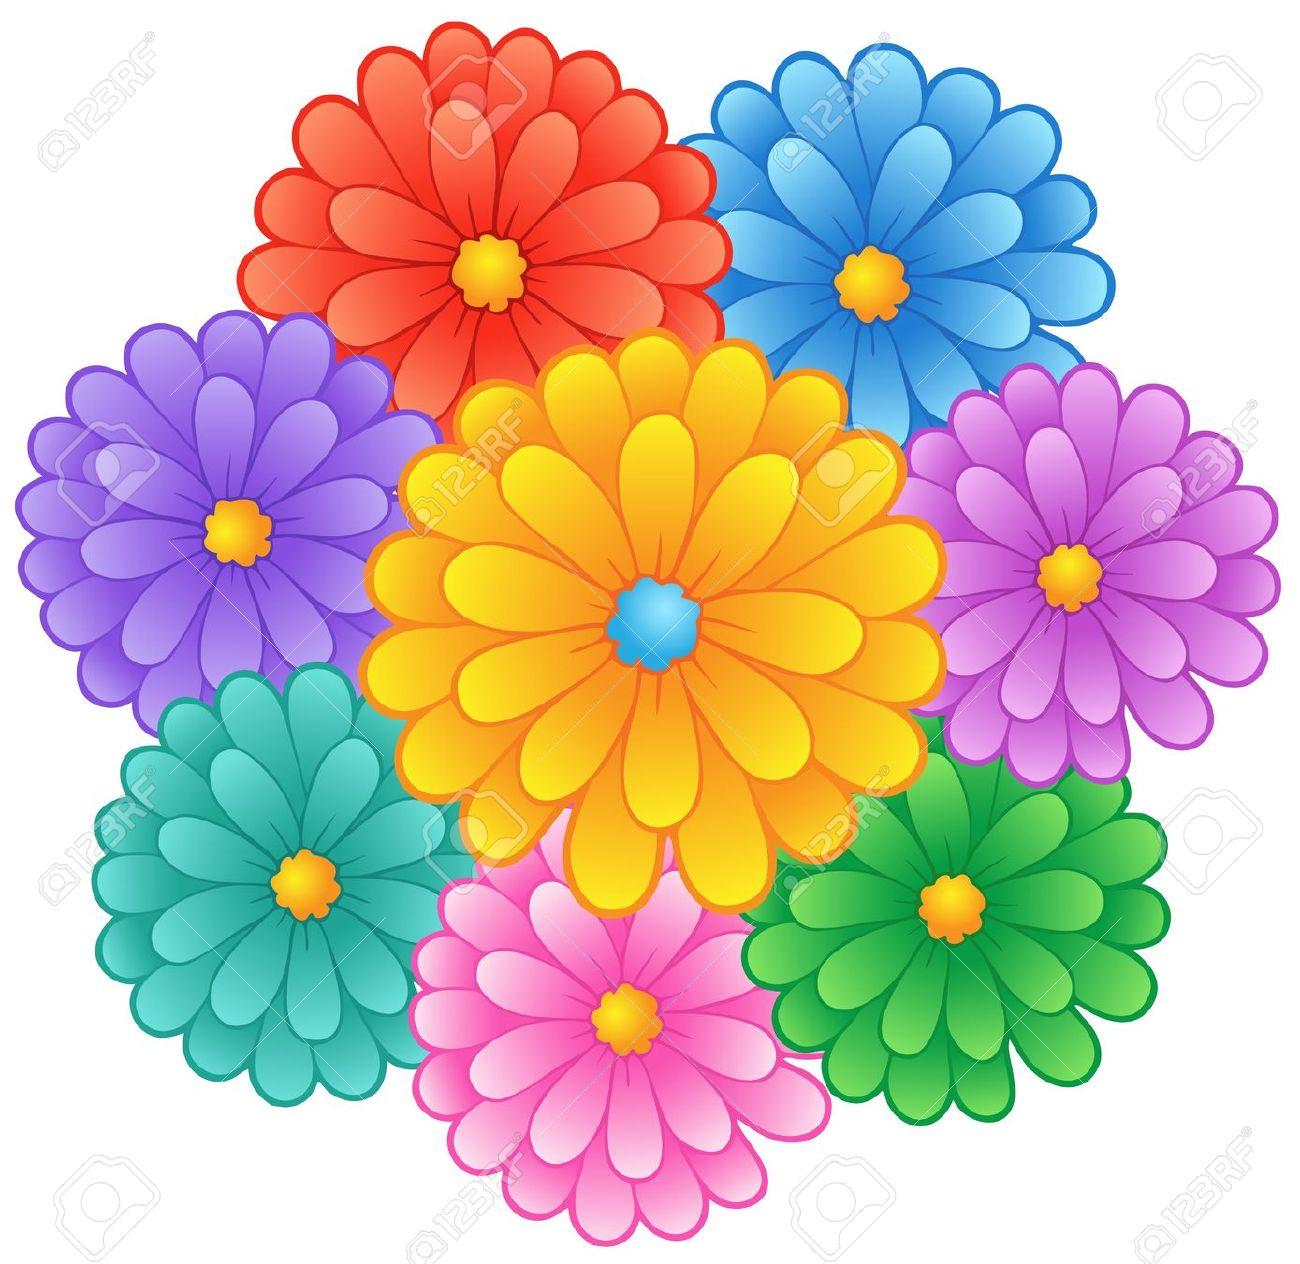 Cartoon Flower Pictures